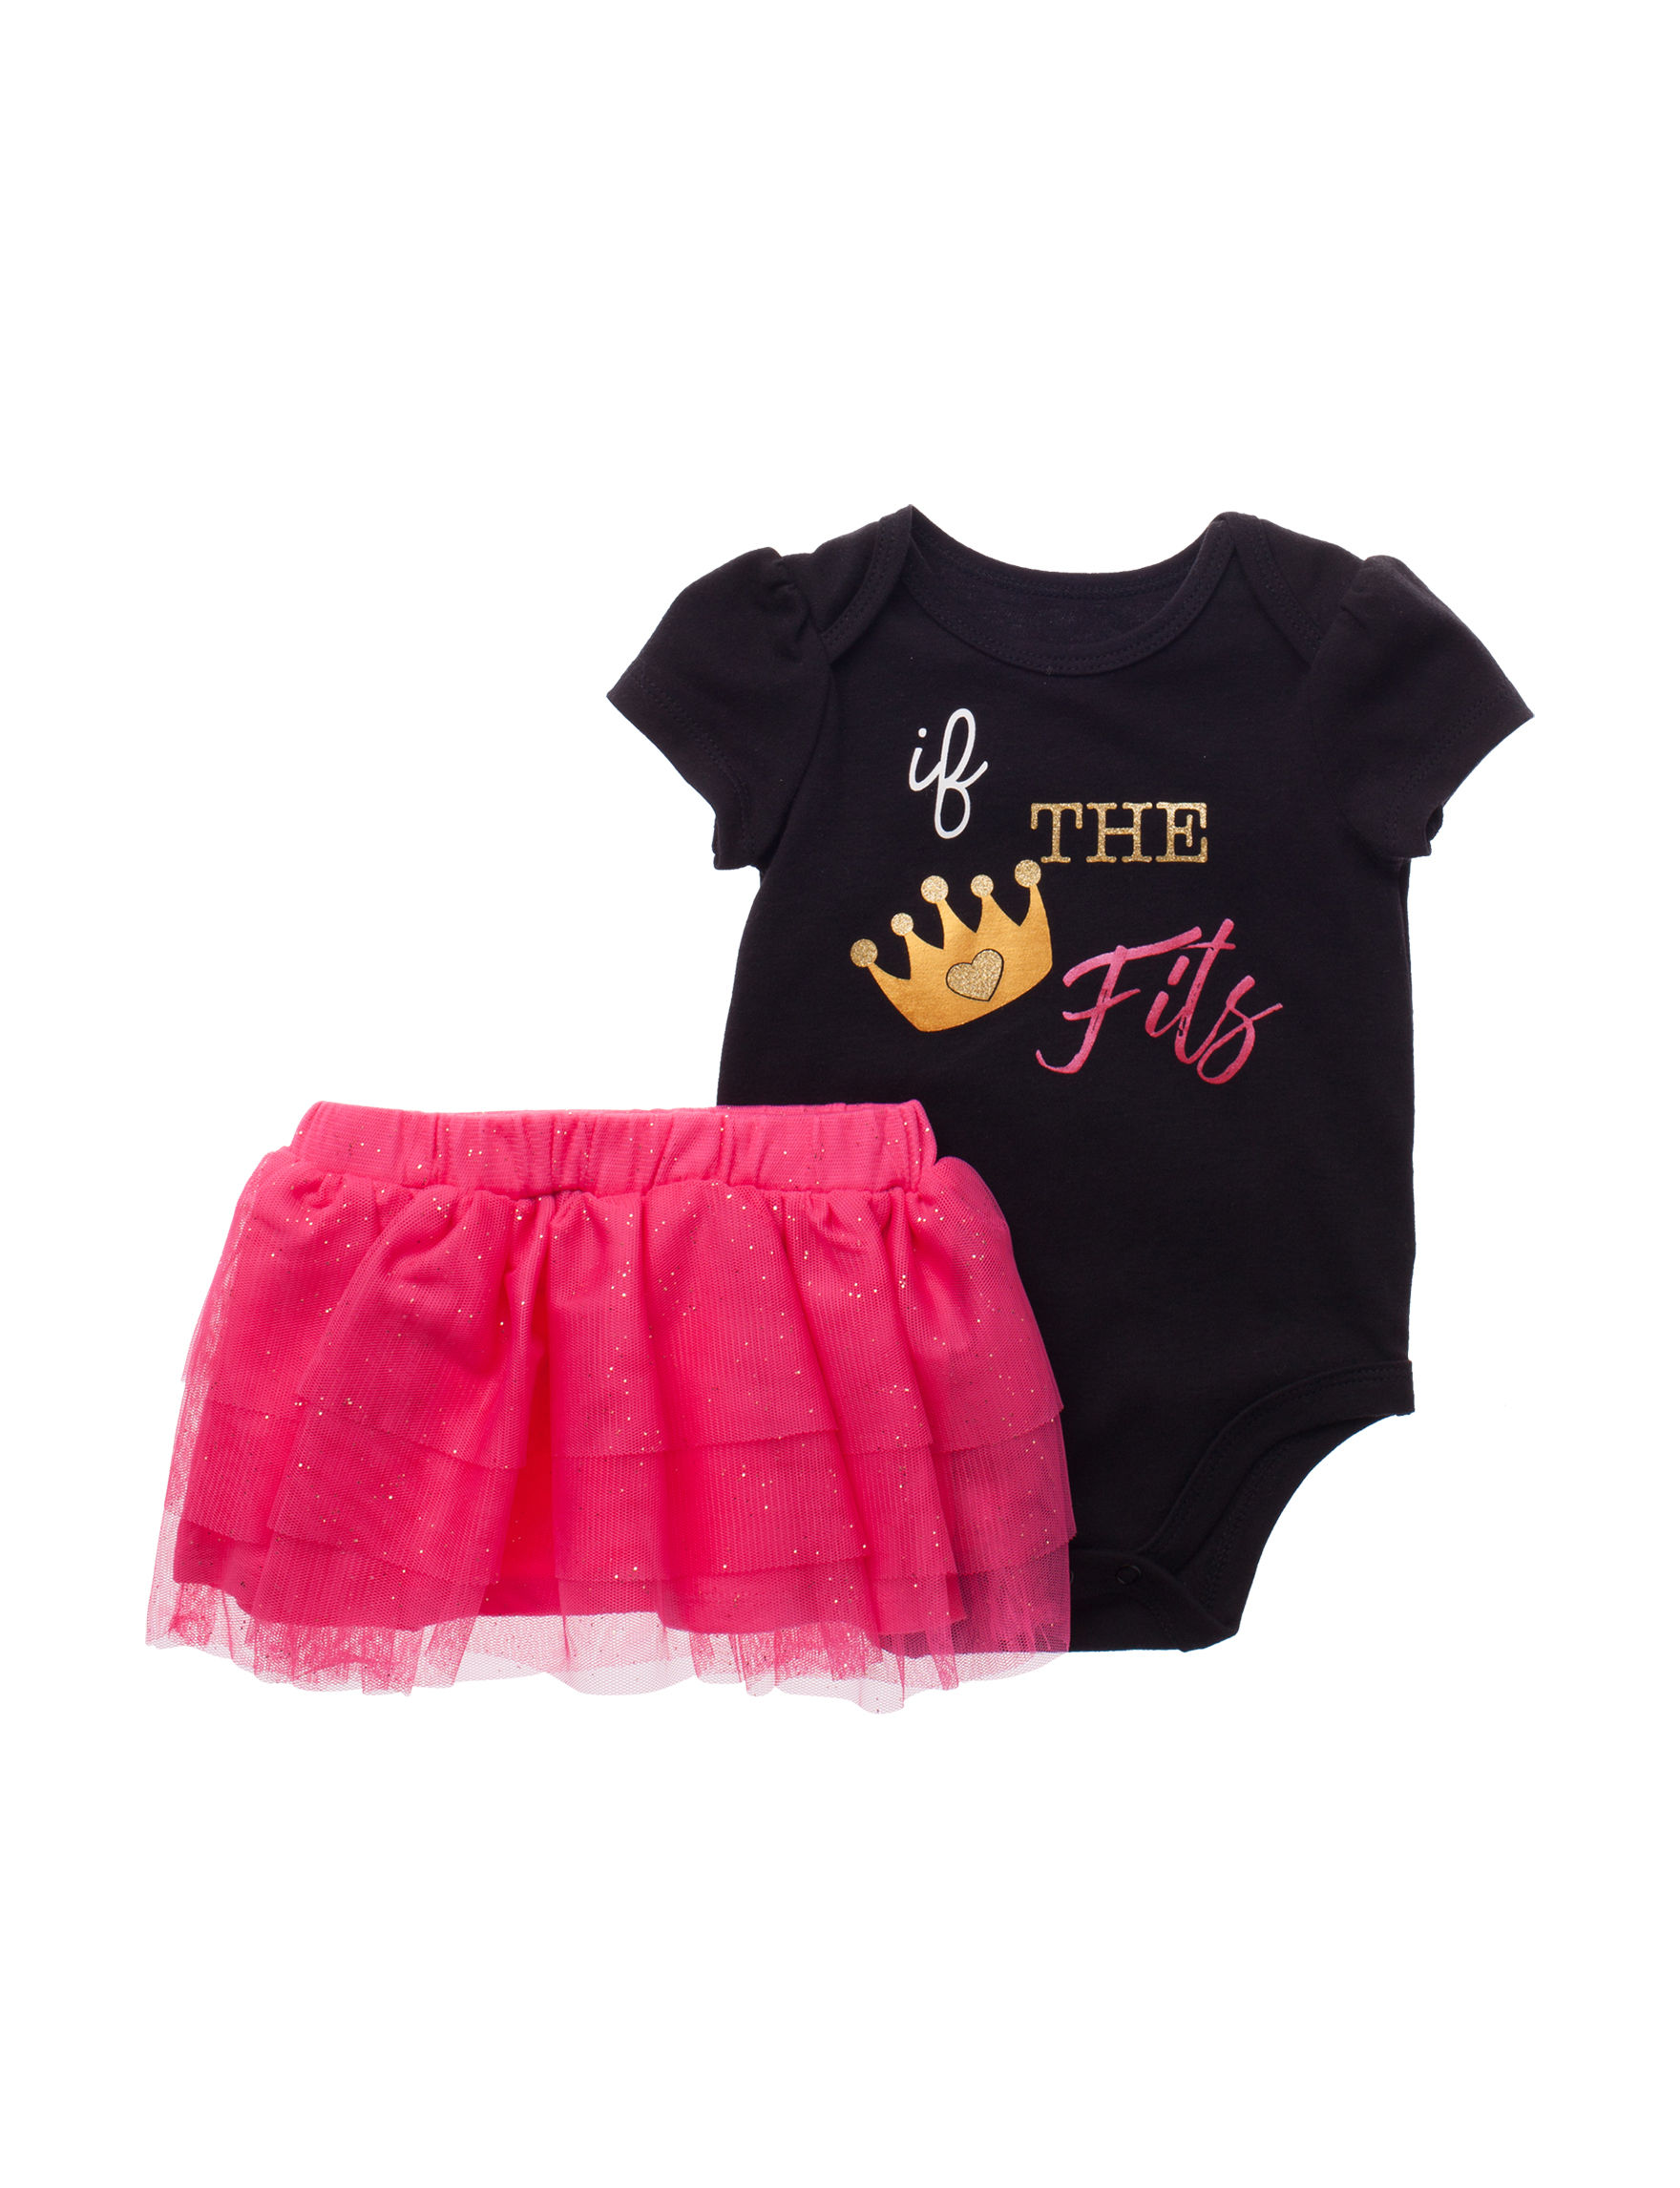 Baby Starters Black / Pink